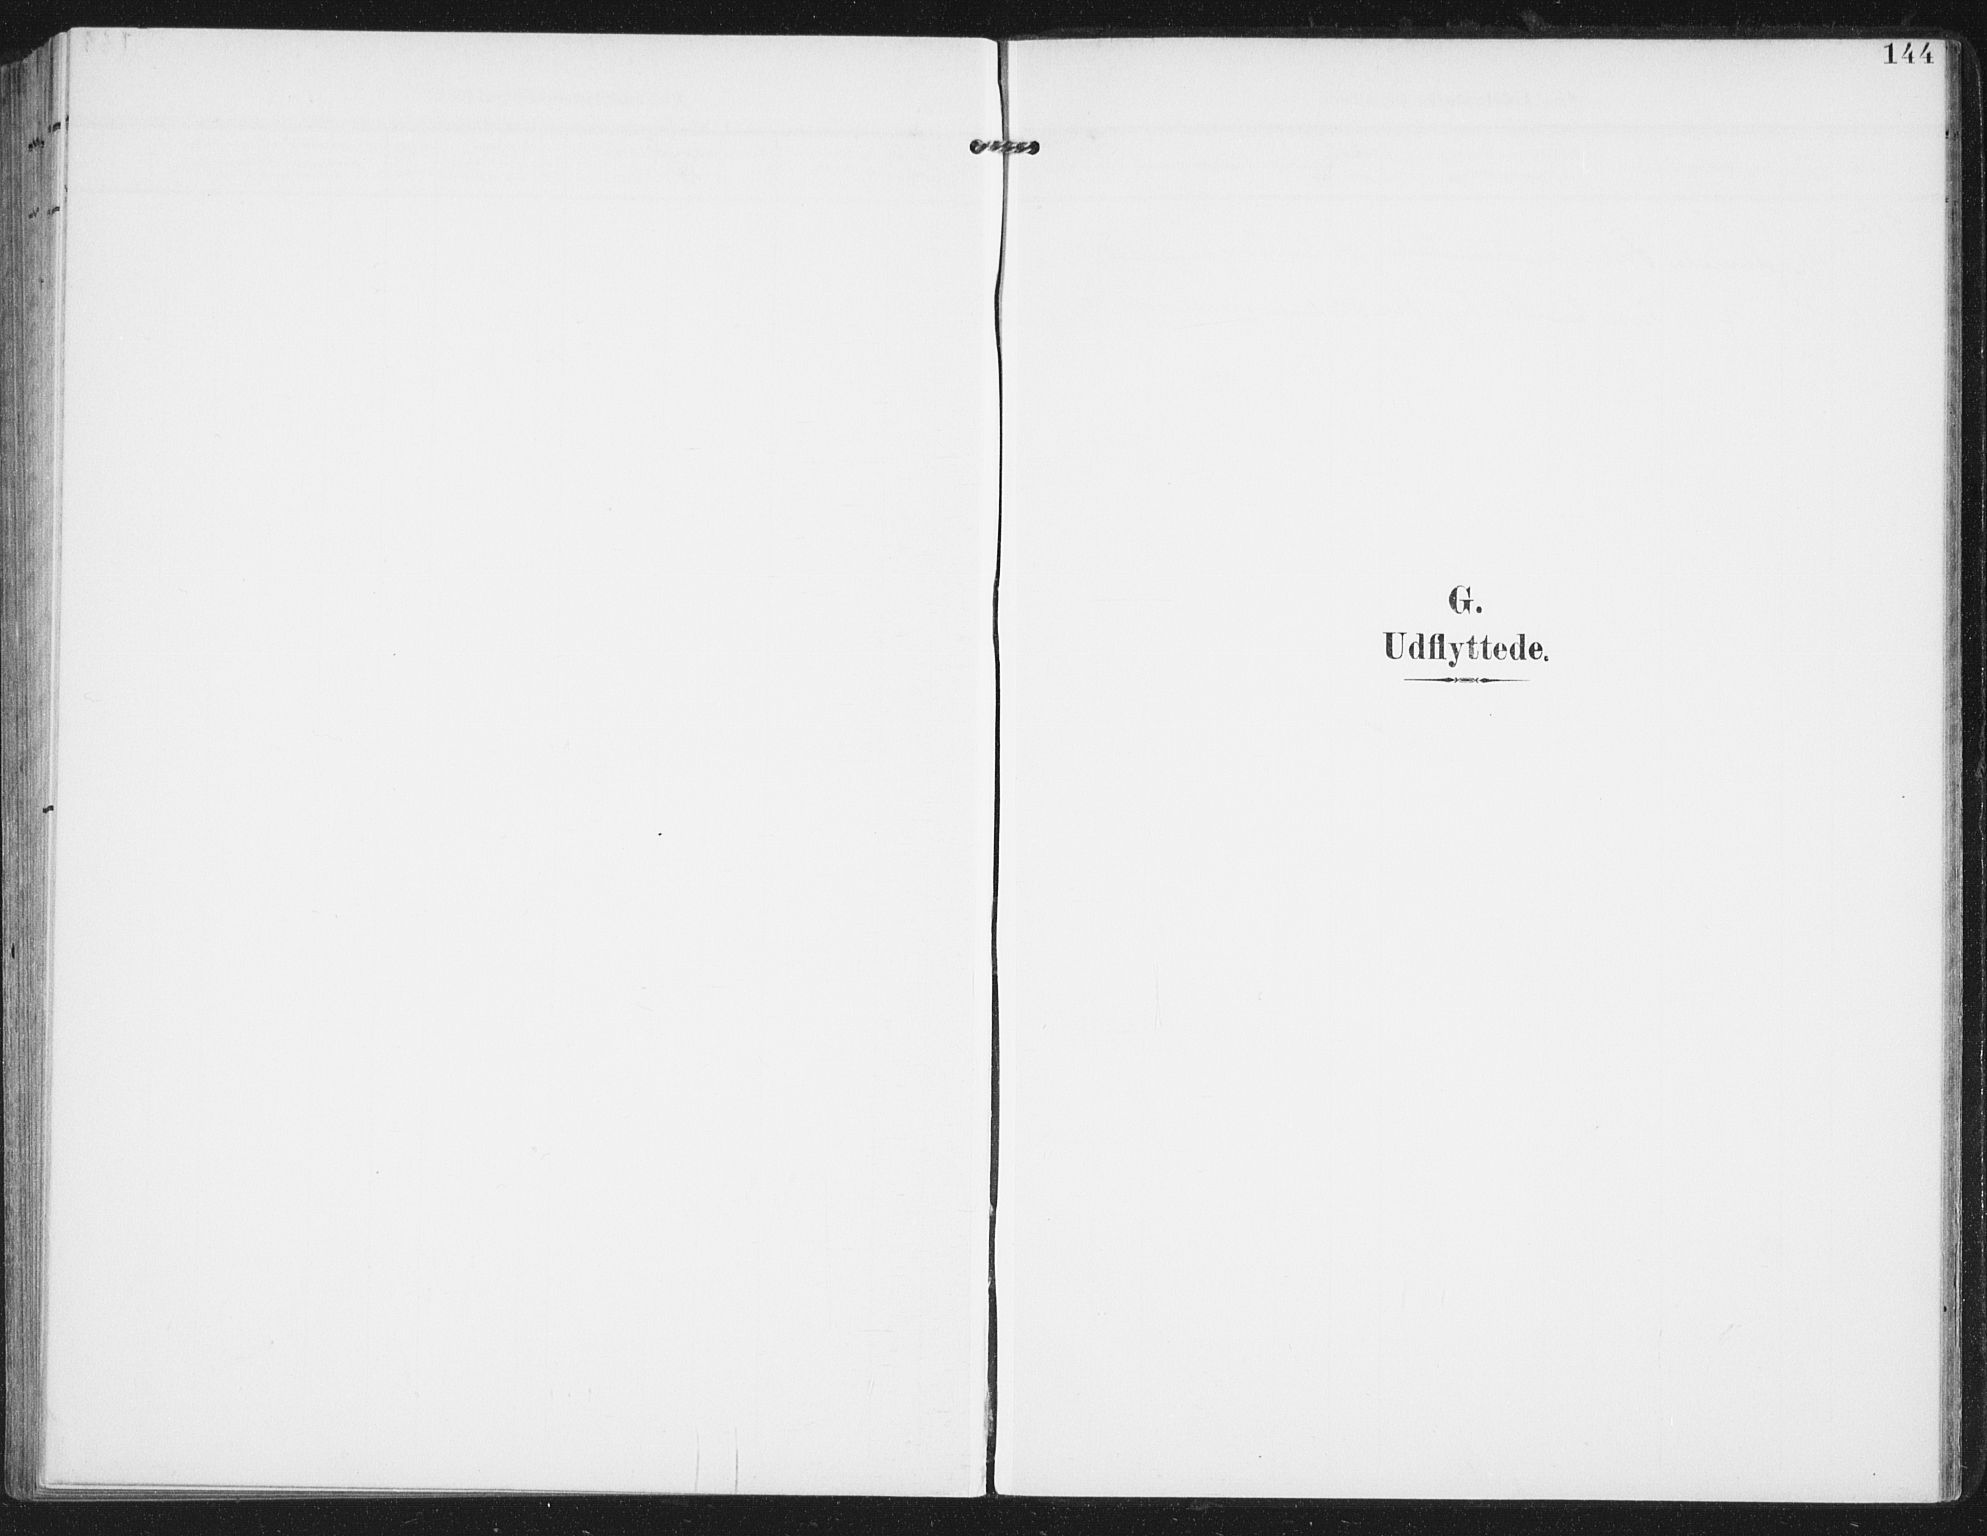 SAT, Ministerialprotokoller, klokkerbøker og fødselsregistre - Nordland, 886/L1221: Ministerialbok nr. 886A03, 1903-1913, s. 144